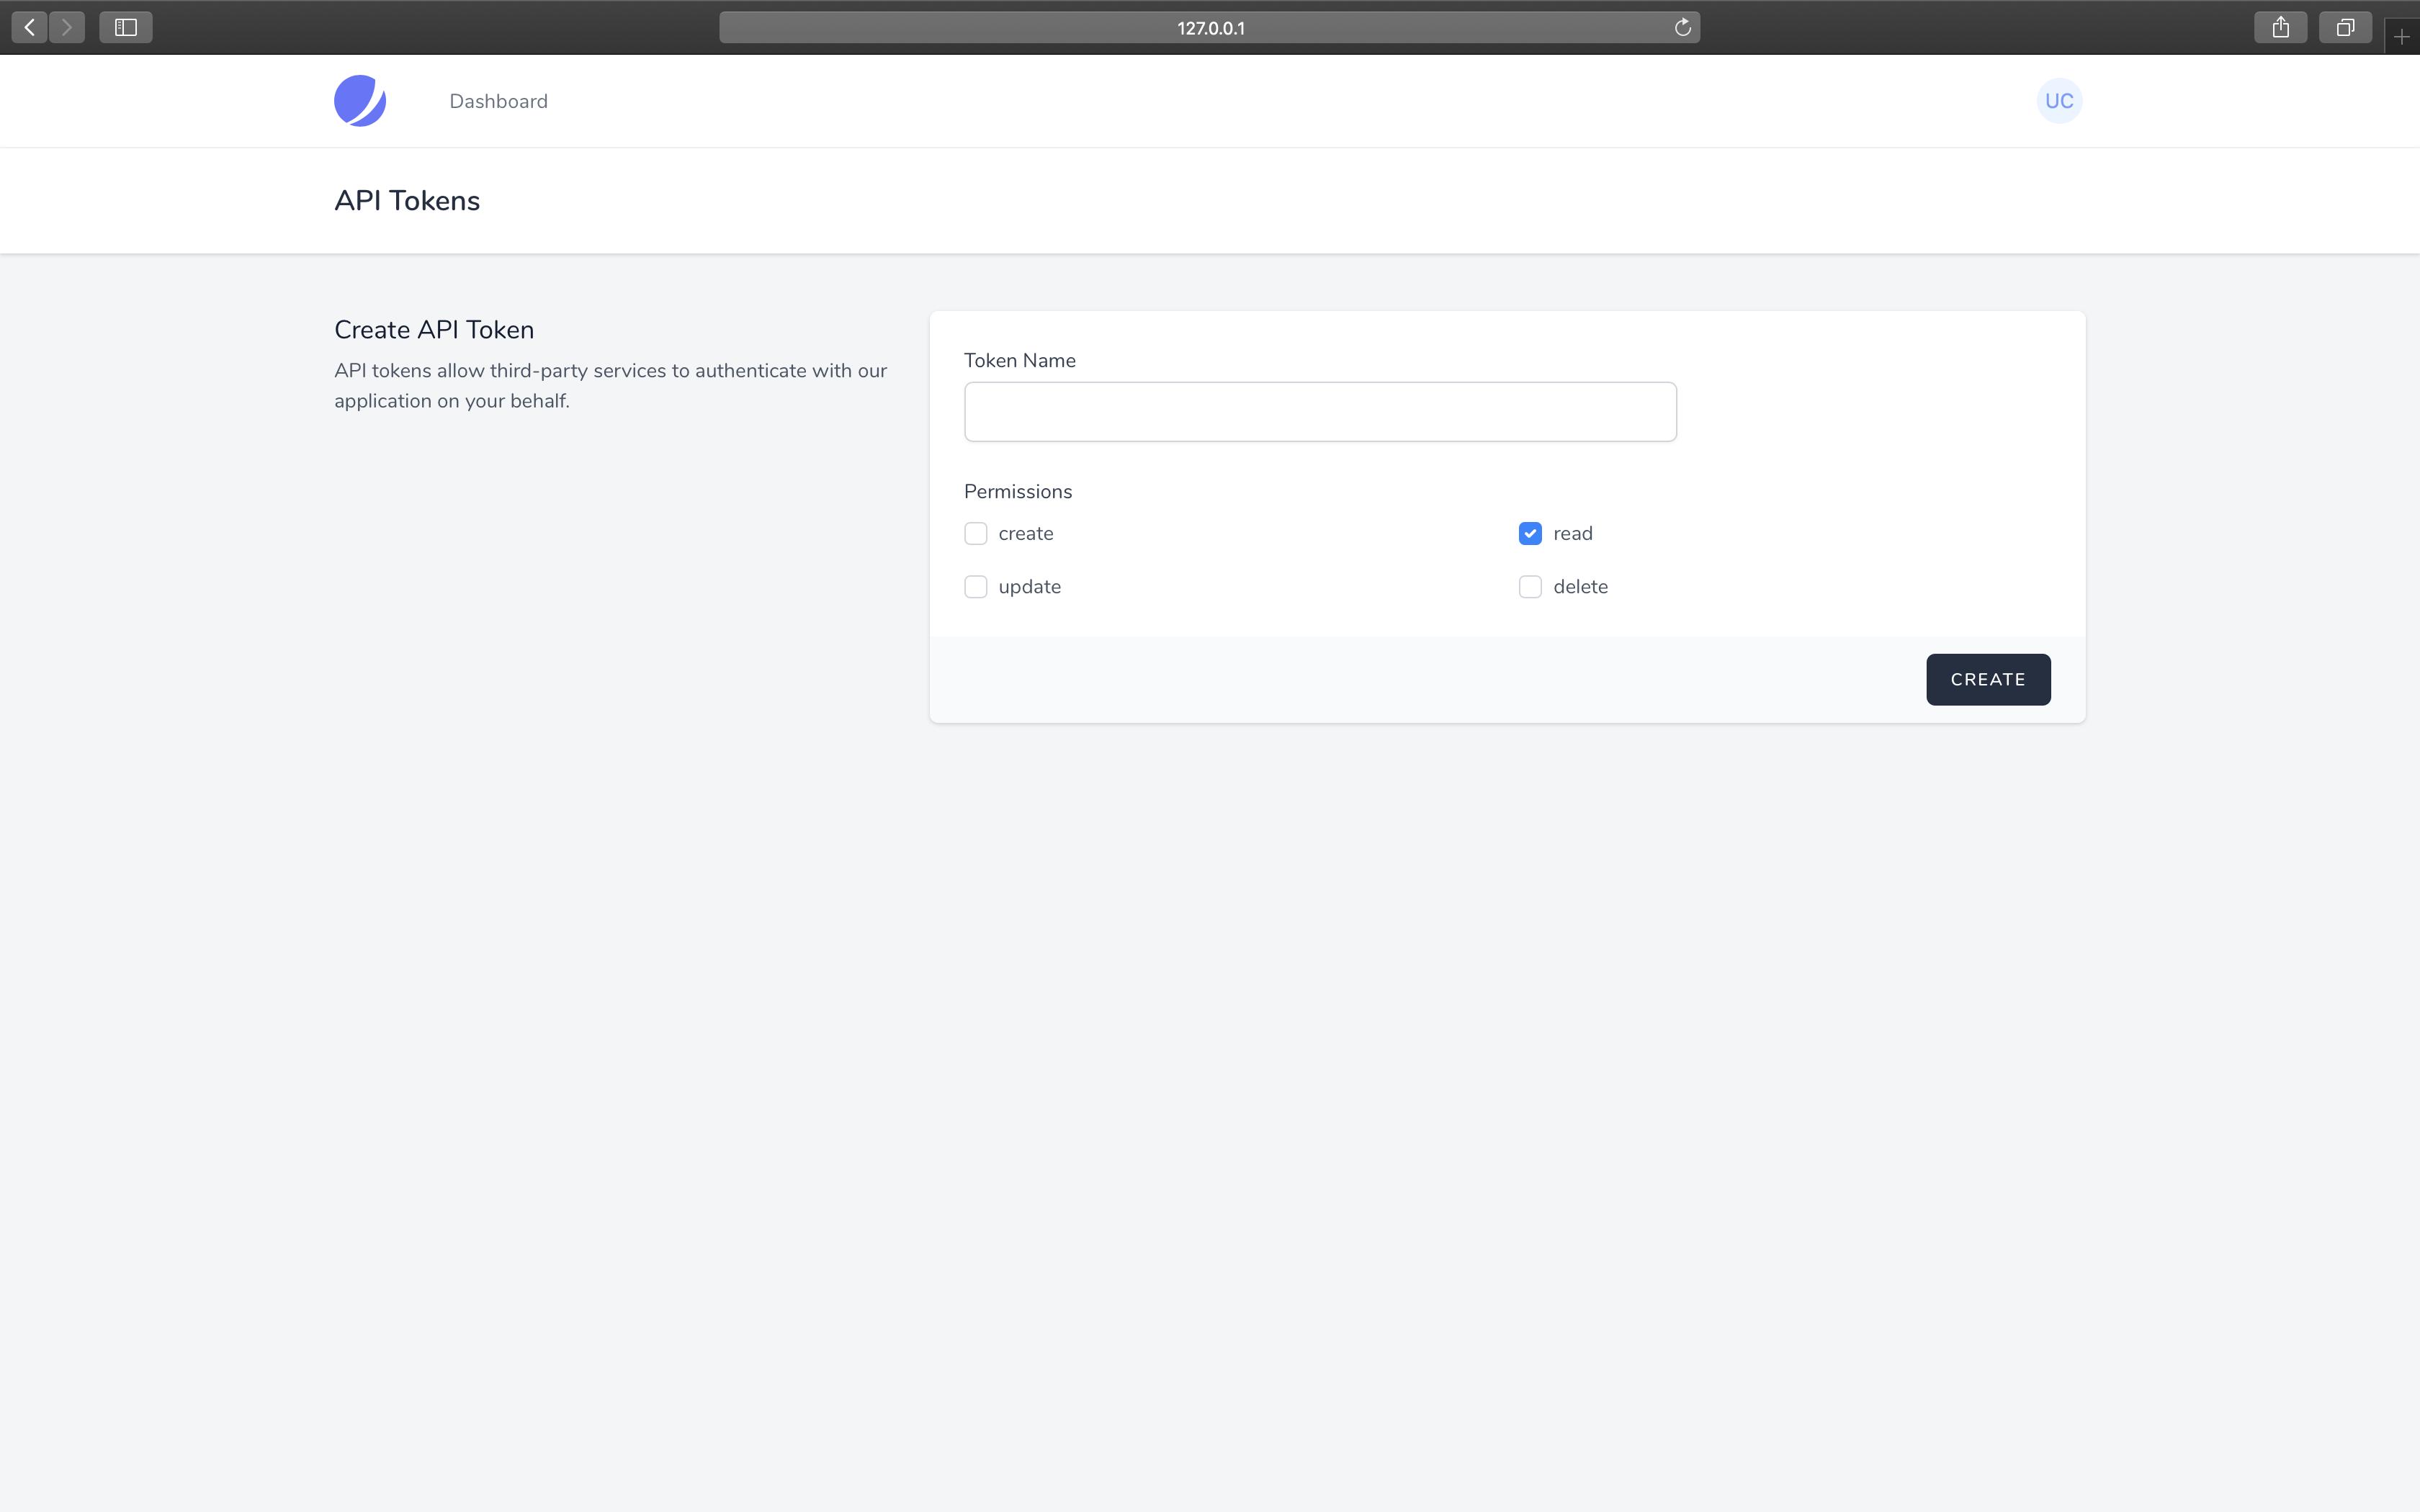 ScreenShot 2020-09-12 4.51.10.png